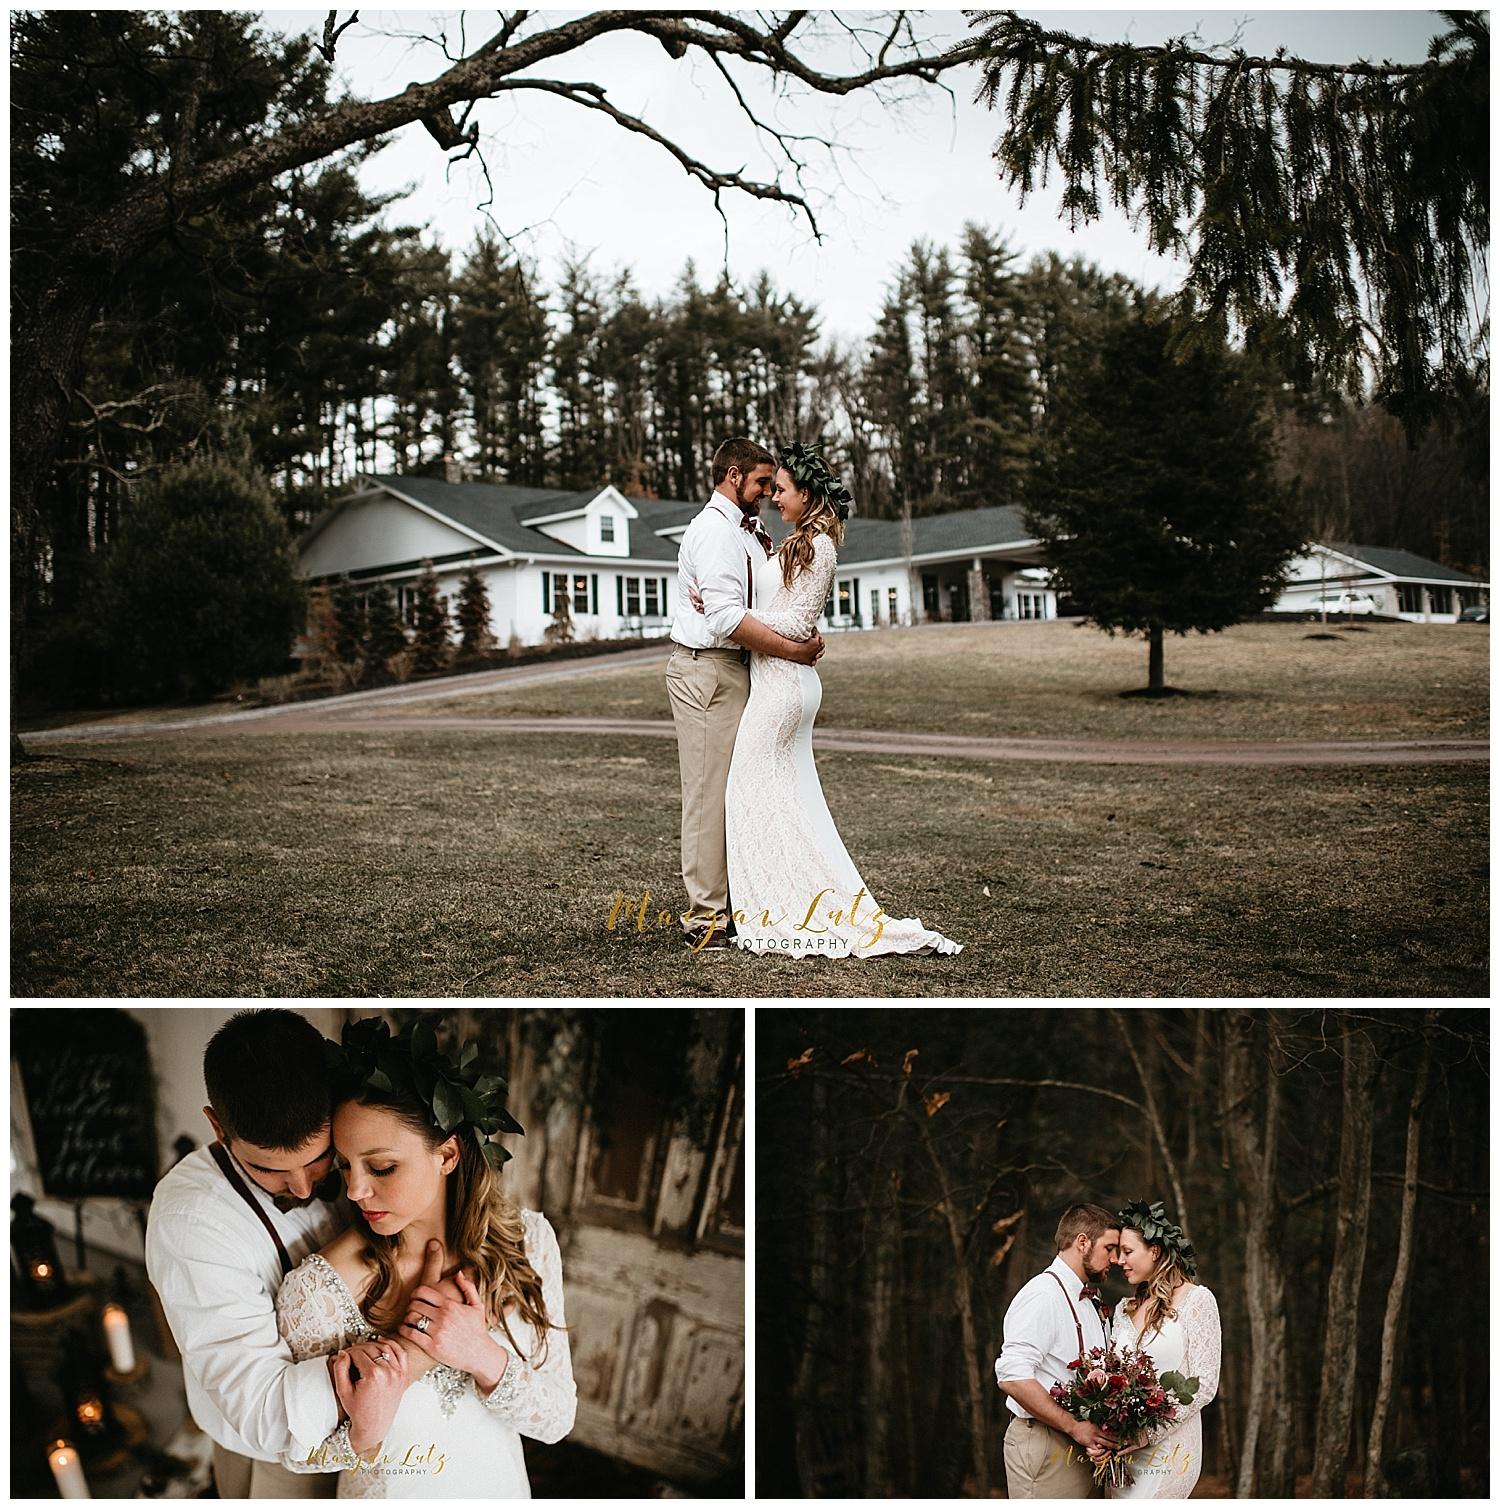 NEPA-wedding-engagement-photographer-whitewoods-weddings-venue-Wapwallopen-PA_0081.jpg